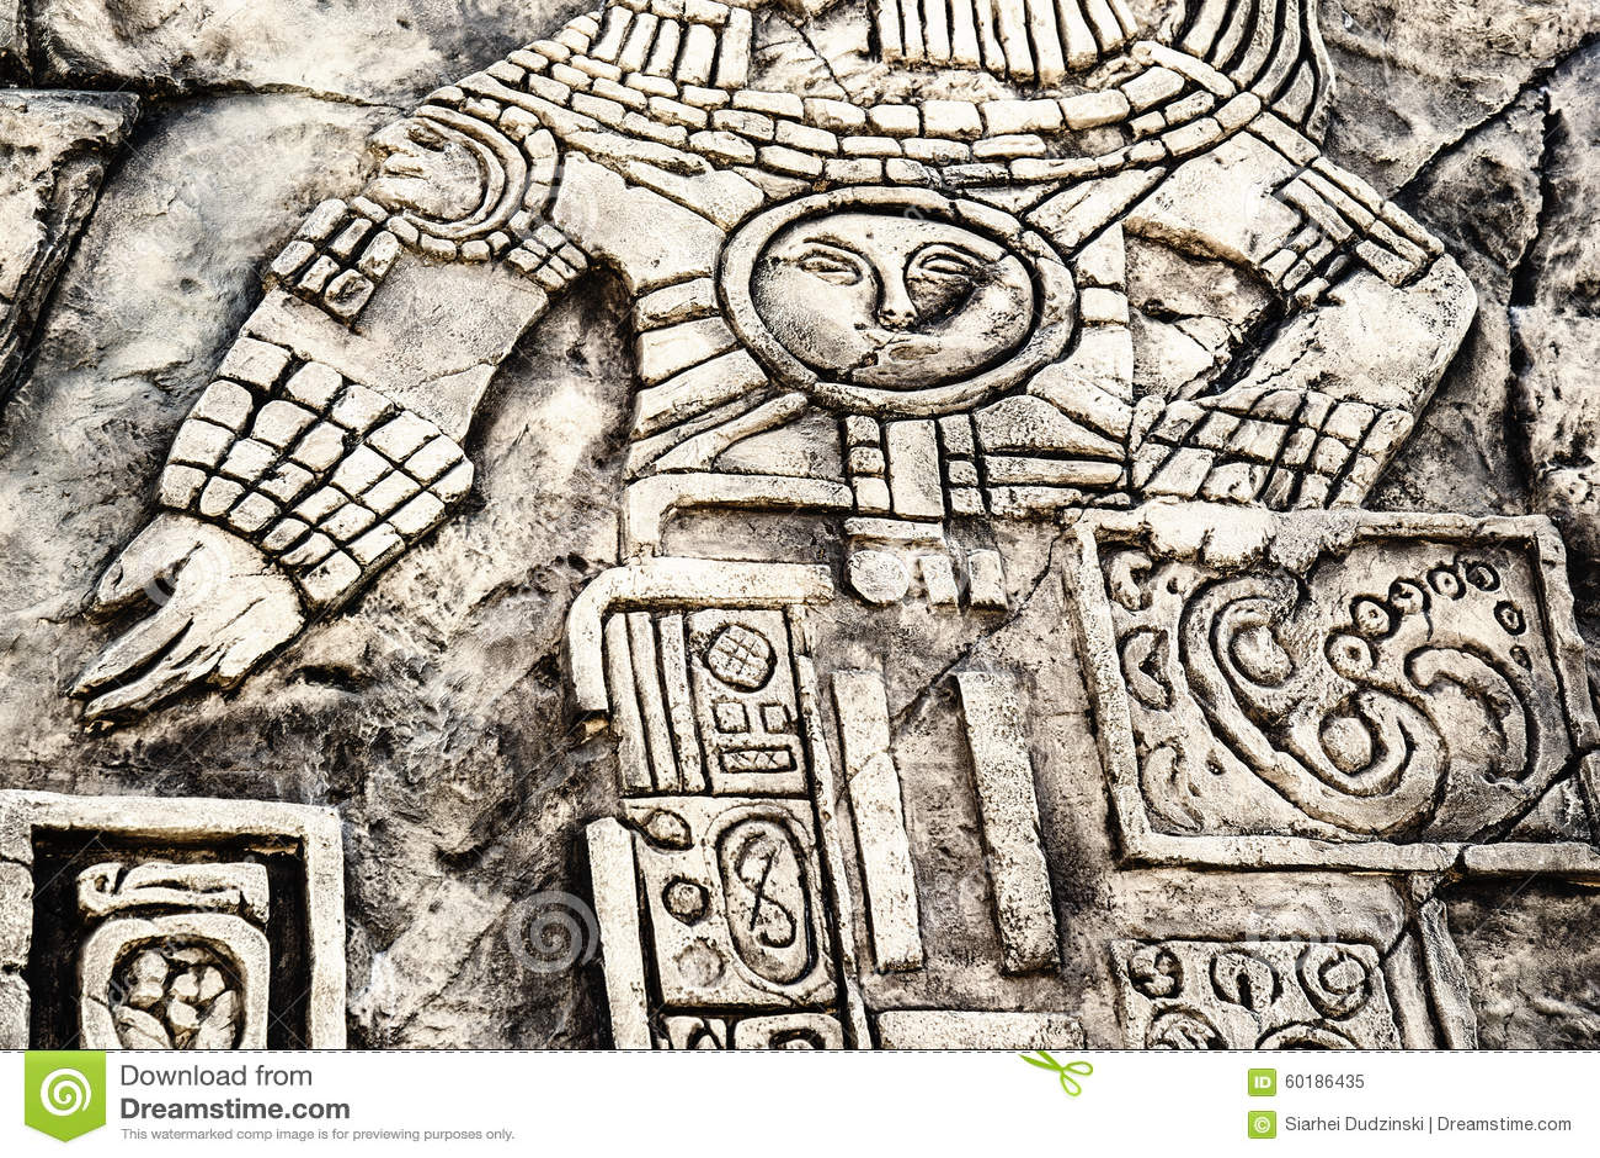 Ancient Mayan Hieroglyphics Stock Photo Image 60186435